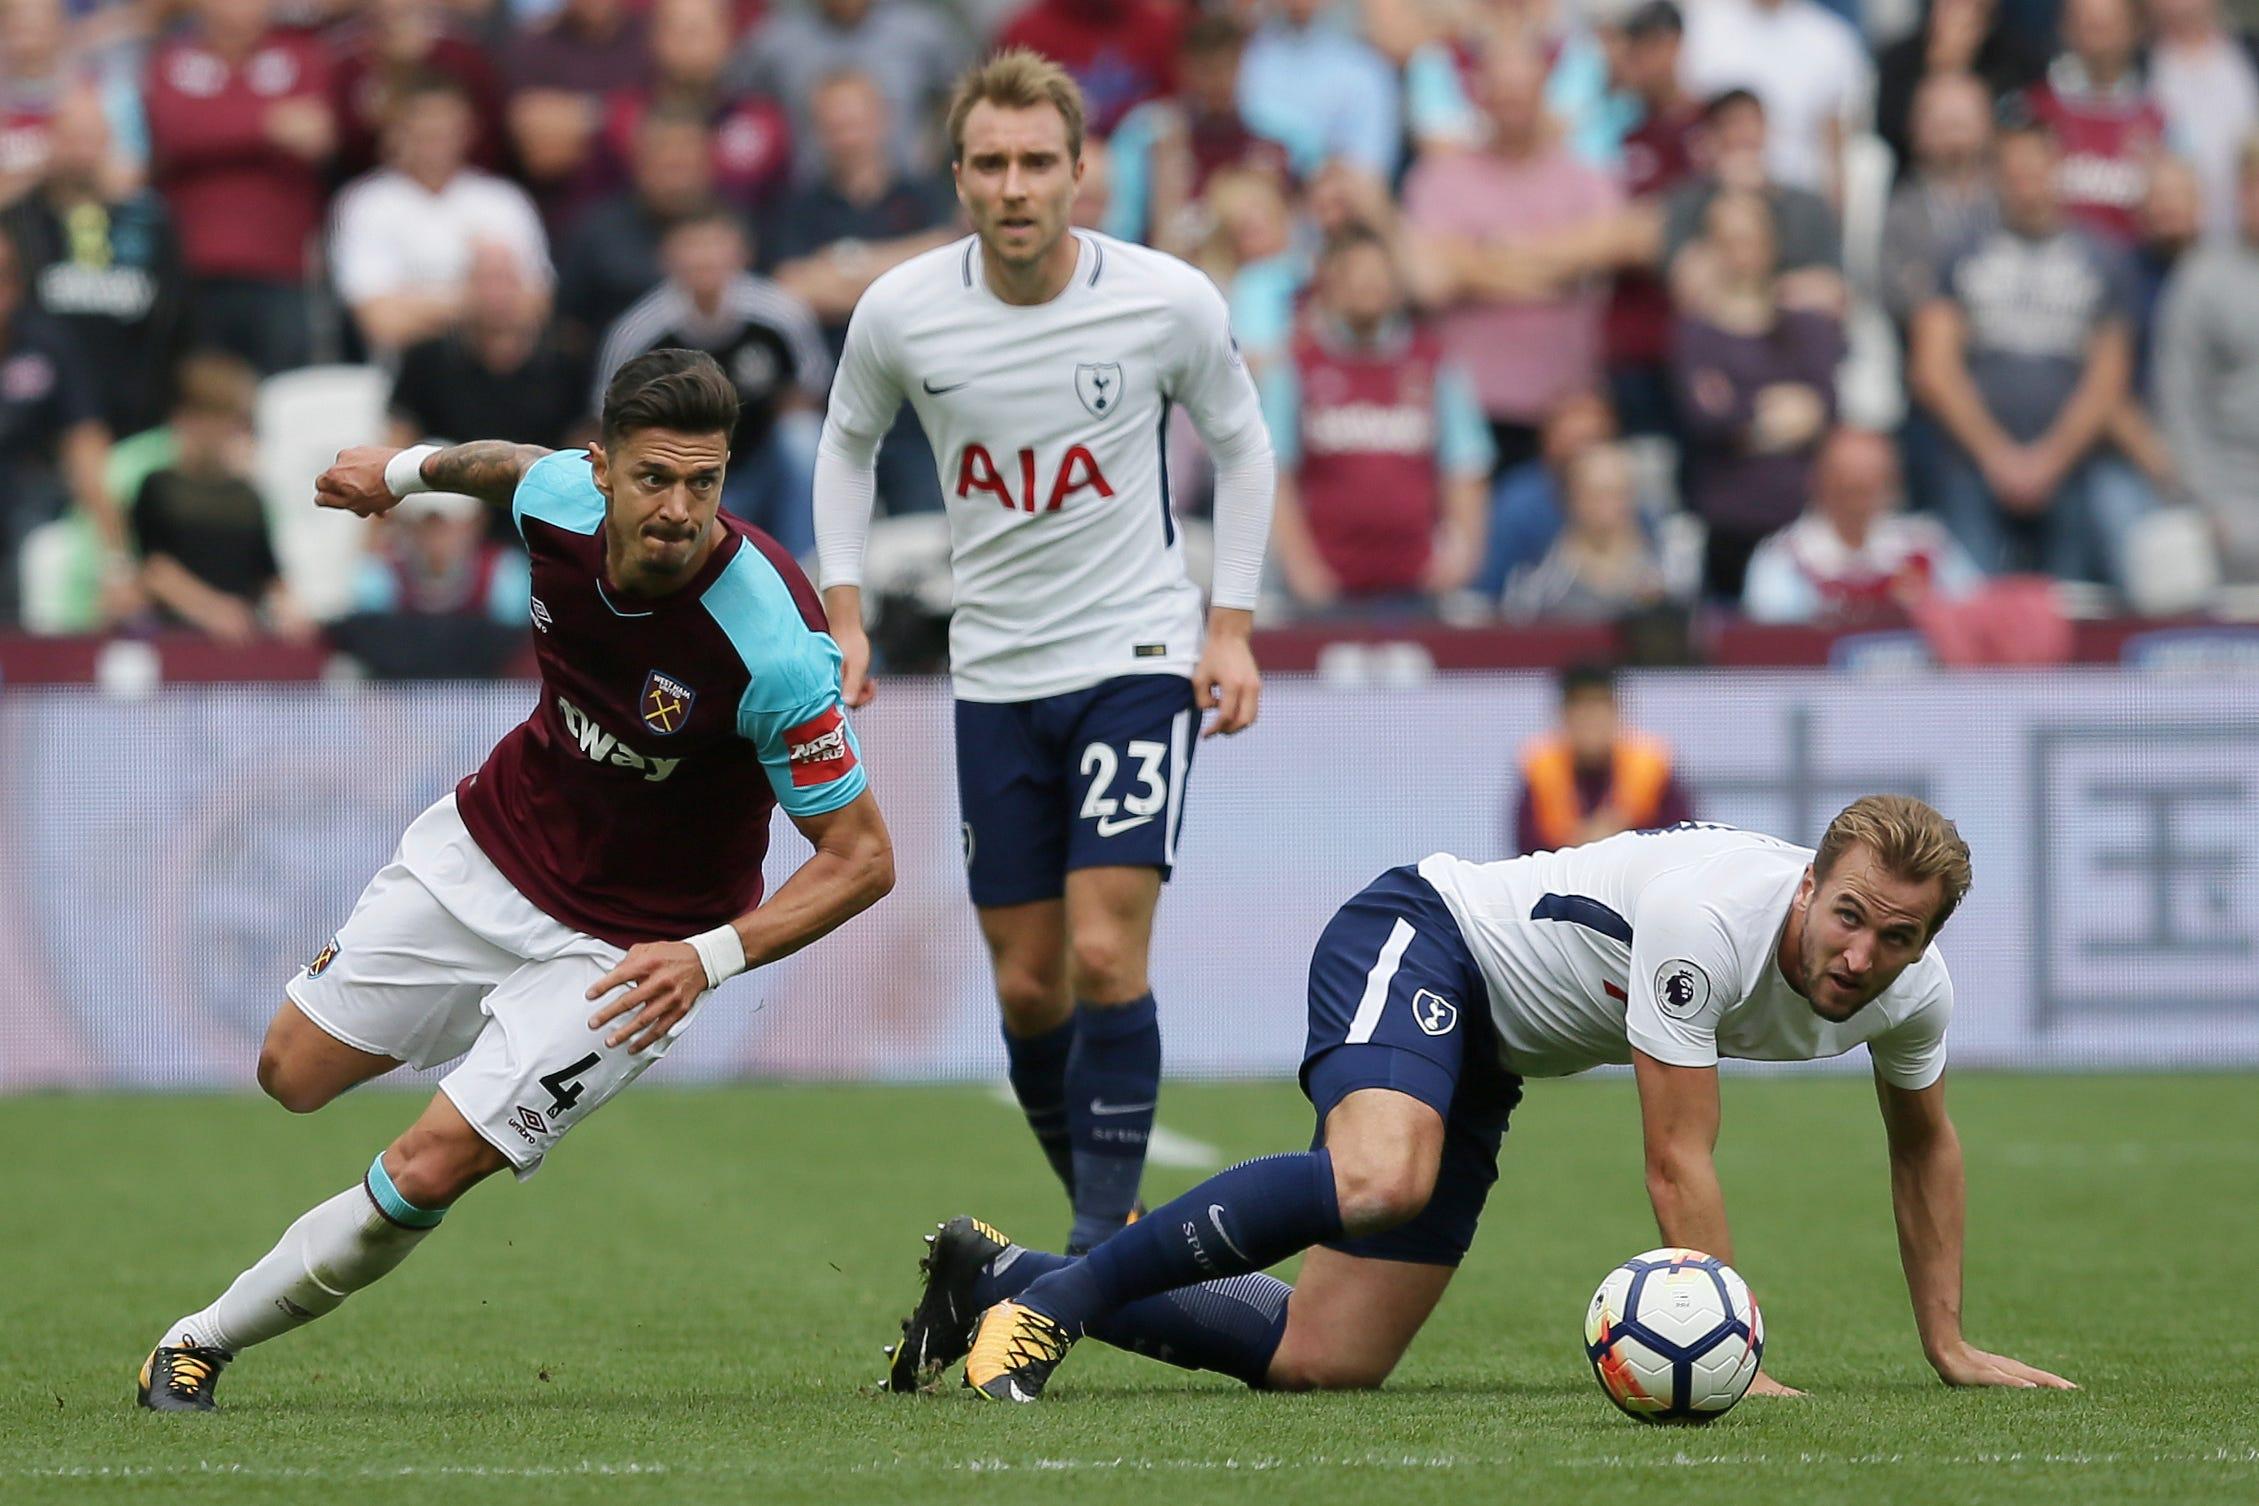 Kane scores 2 as Tottenham holds on to beat West Ham 3-2